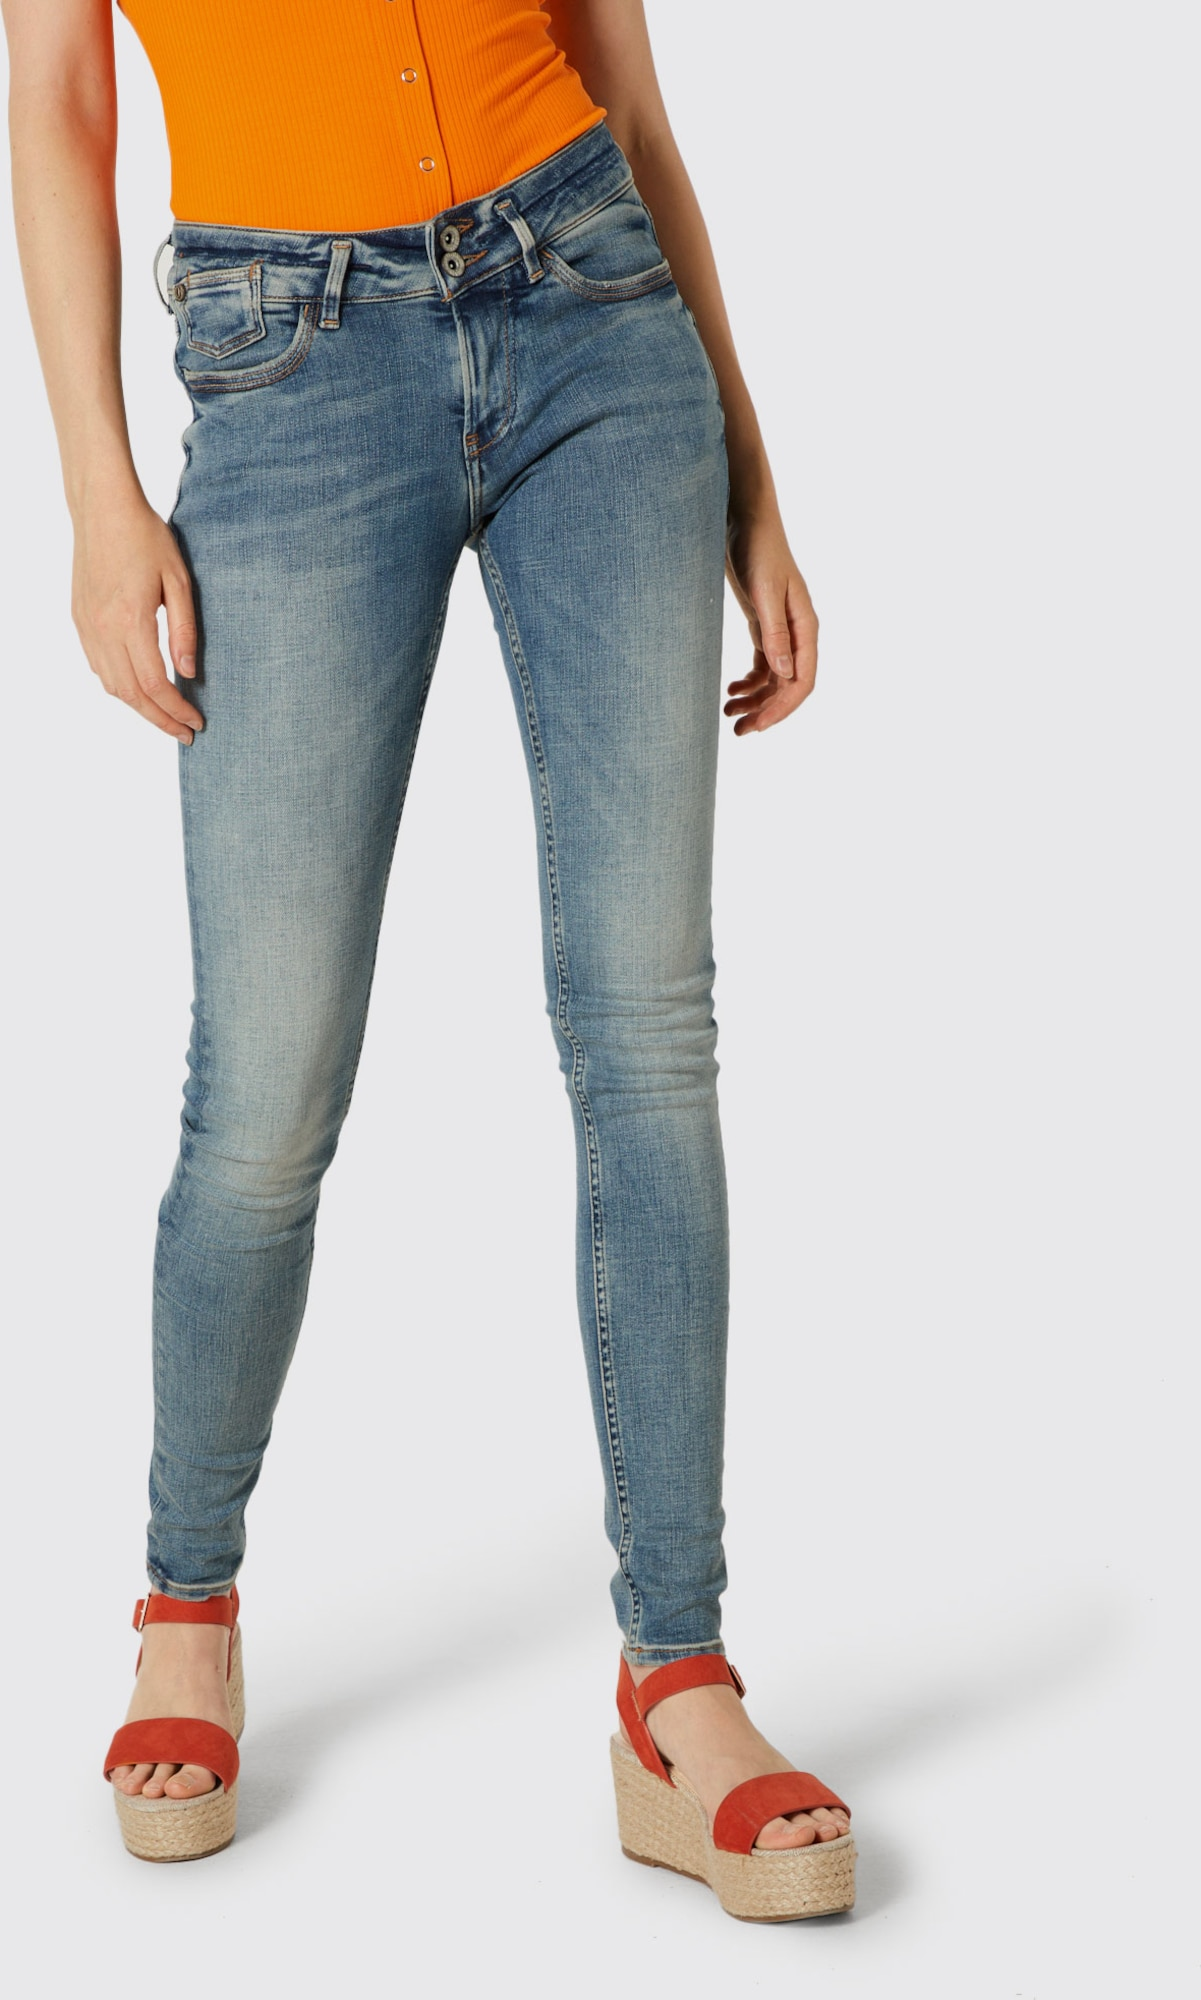 Citaten Weergeven Jeans : Garcia jeans rachelle super slim in blauw about you